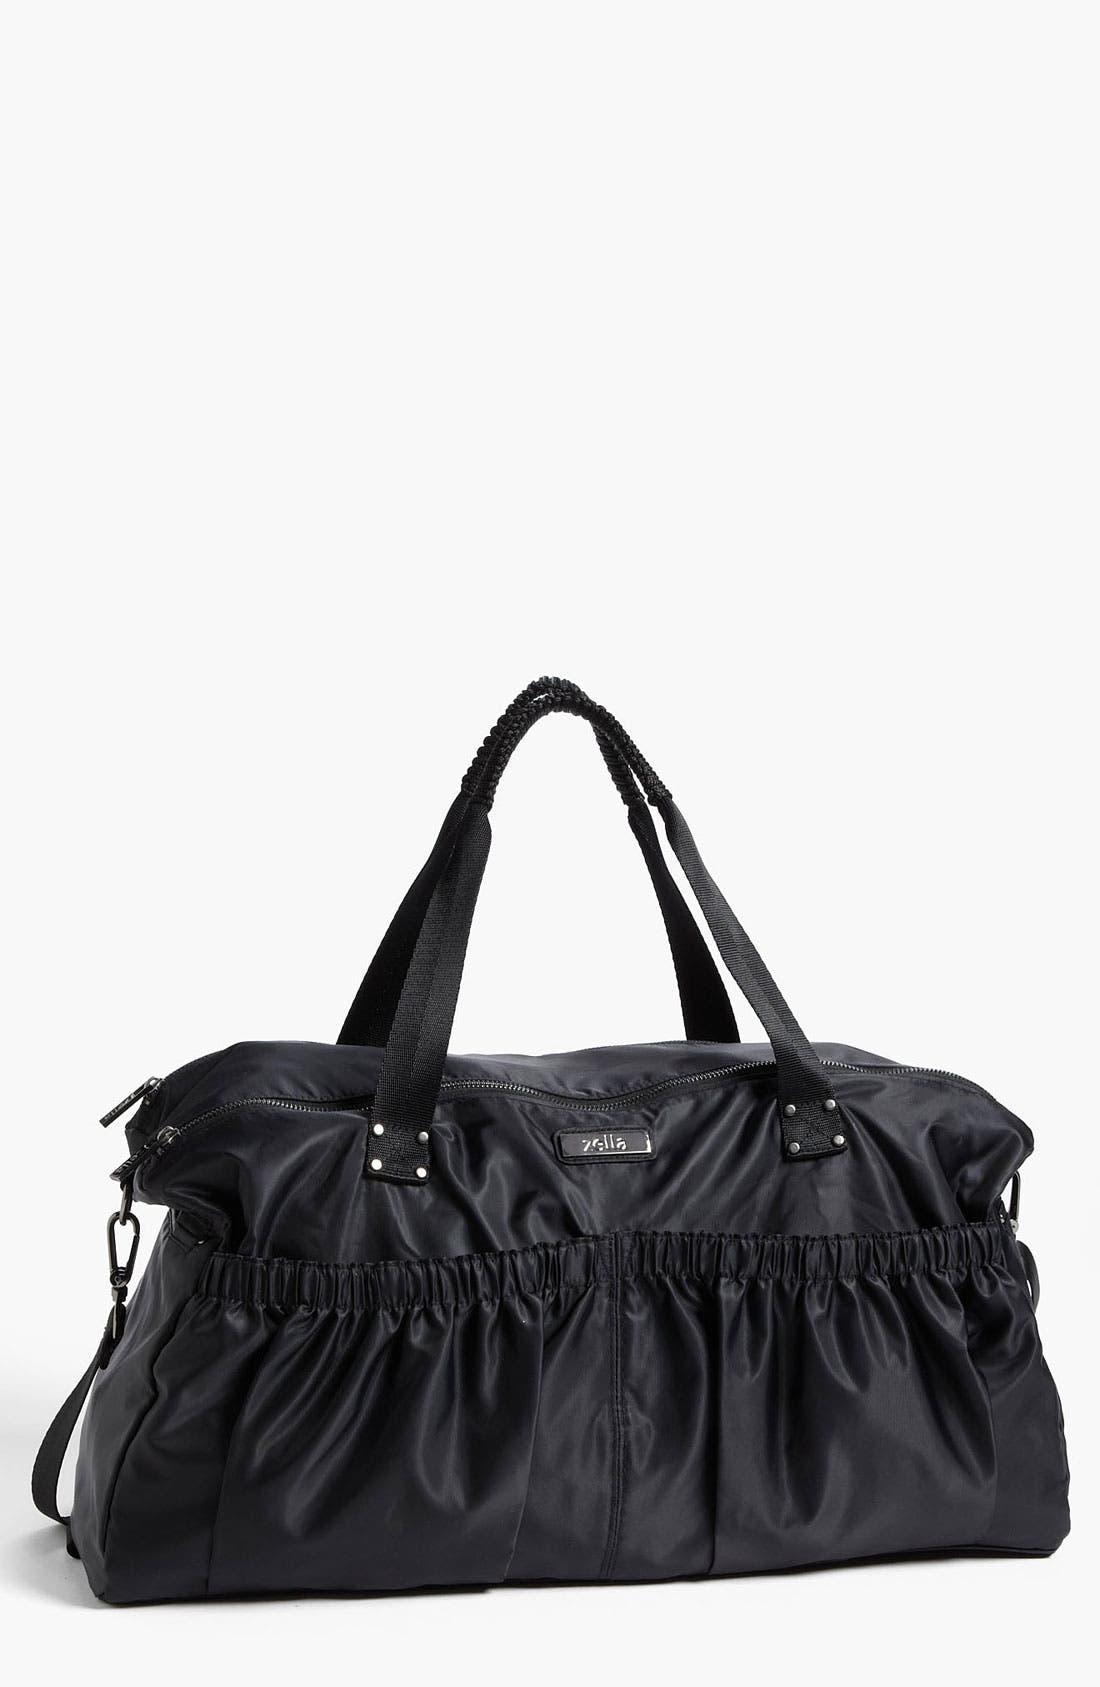 Alternate Image 1 Selected - Zella Pocketed Duffel Bag